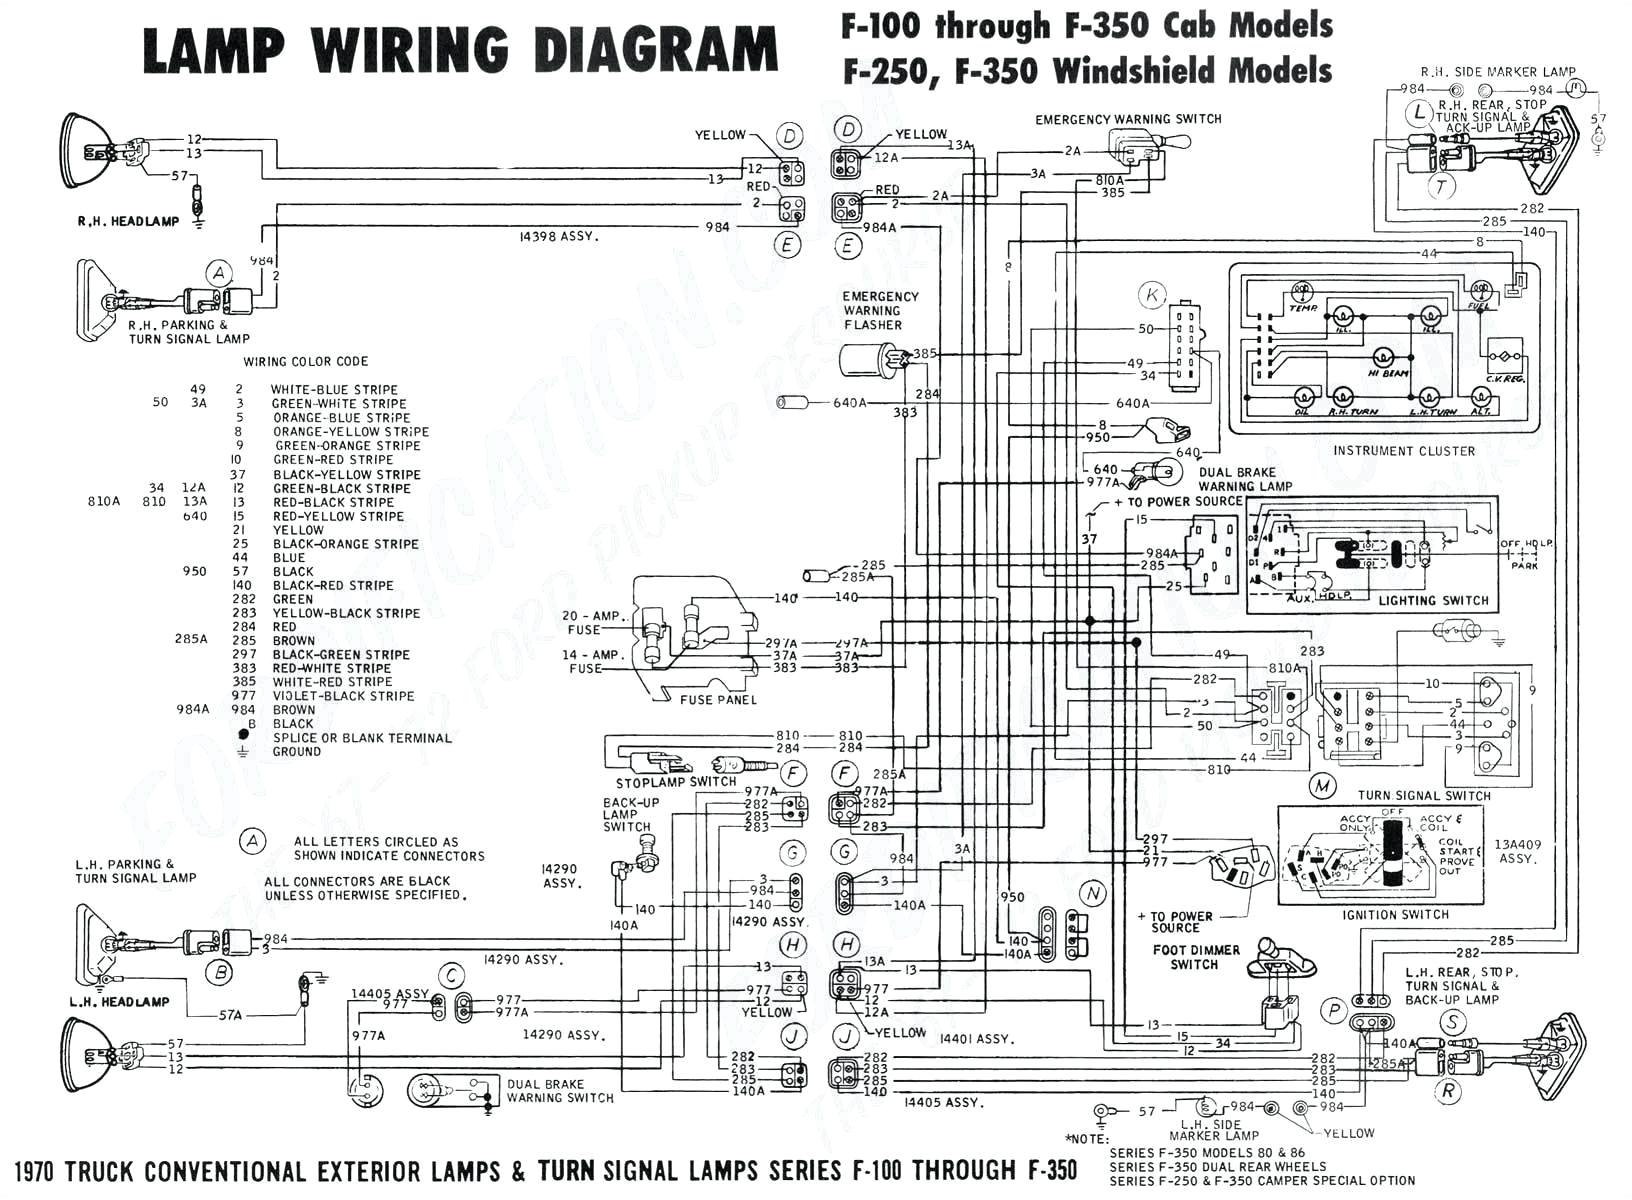 Volvo Penta Electrical Wiring Diagram Electrical Wiring Diagrams 1992 ford Wiring Diagram Blog